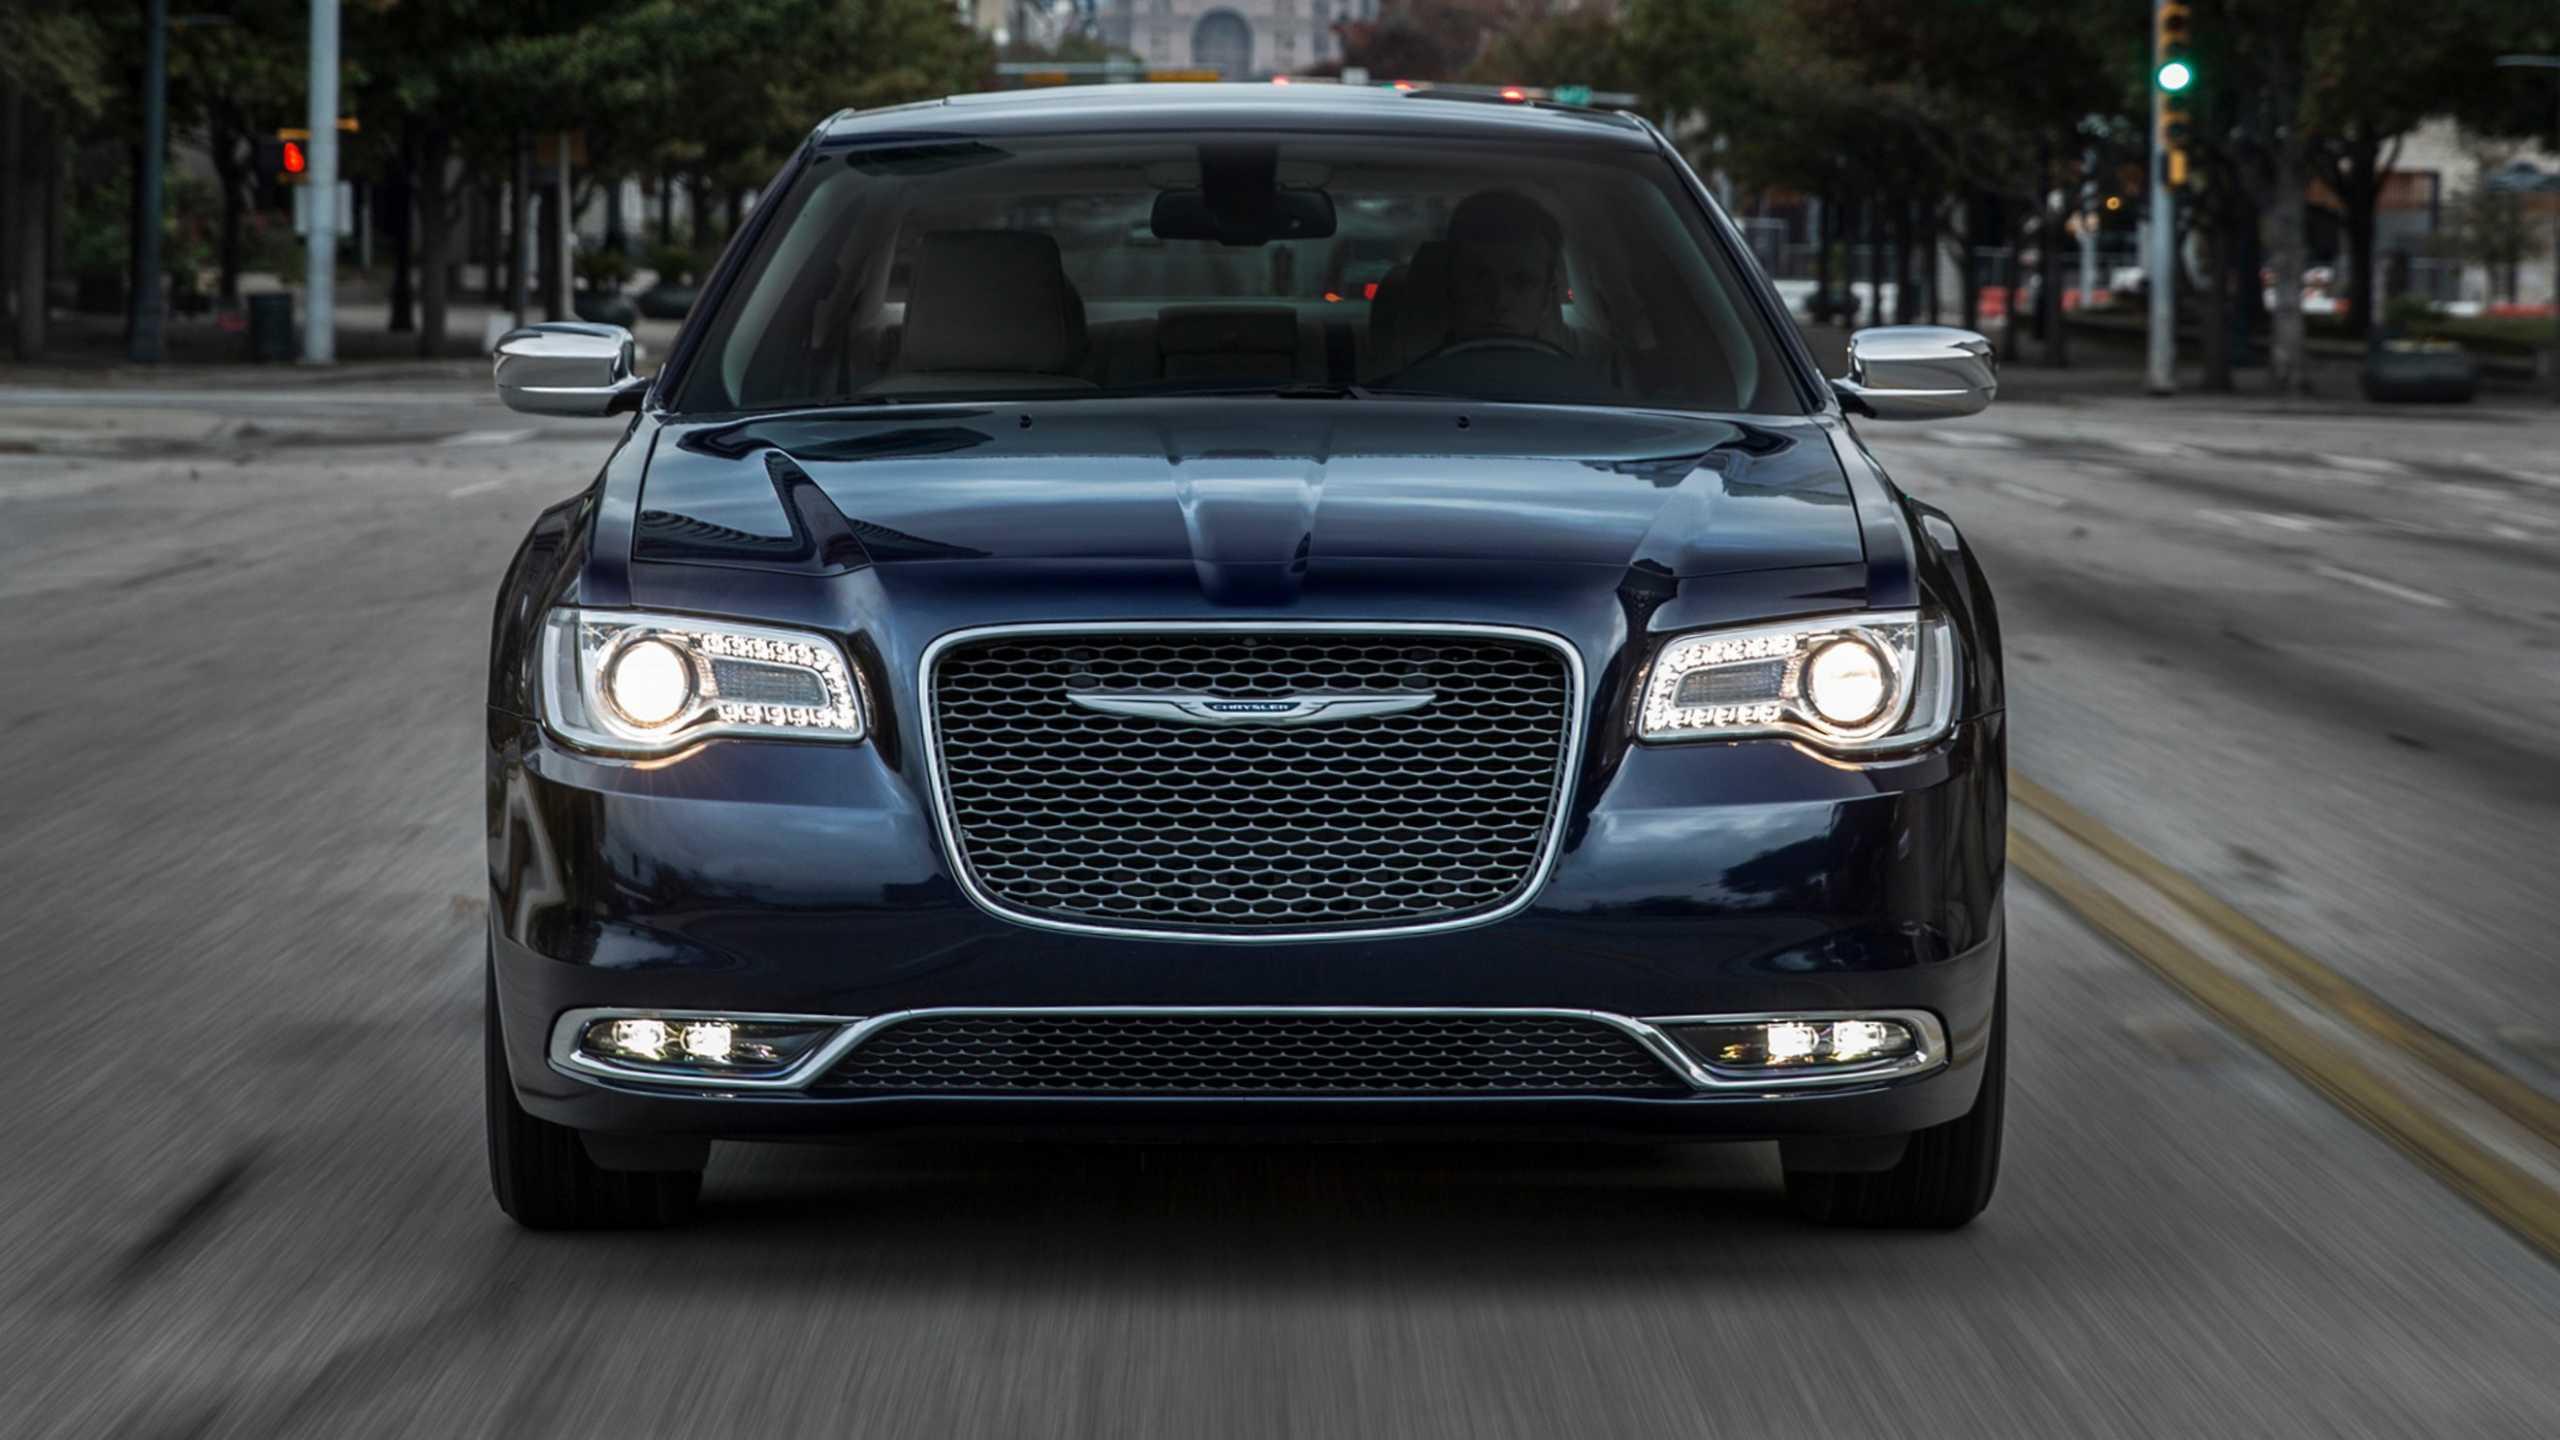 Chrysler: Πιθανό κλείσιμο μετά από τη συγχώνευση FCA και PSA